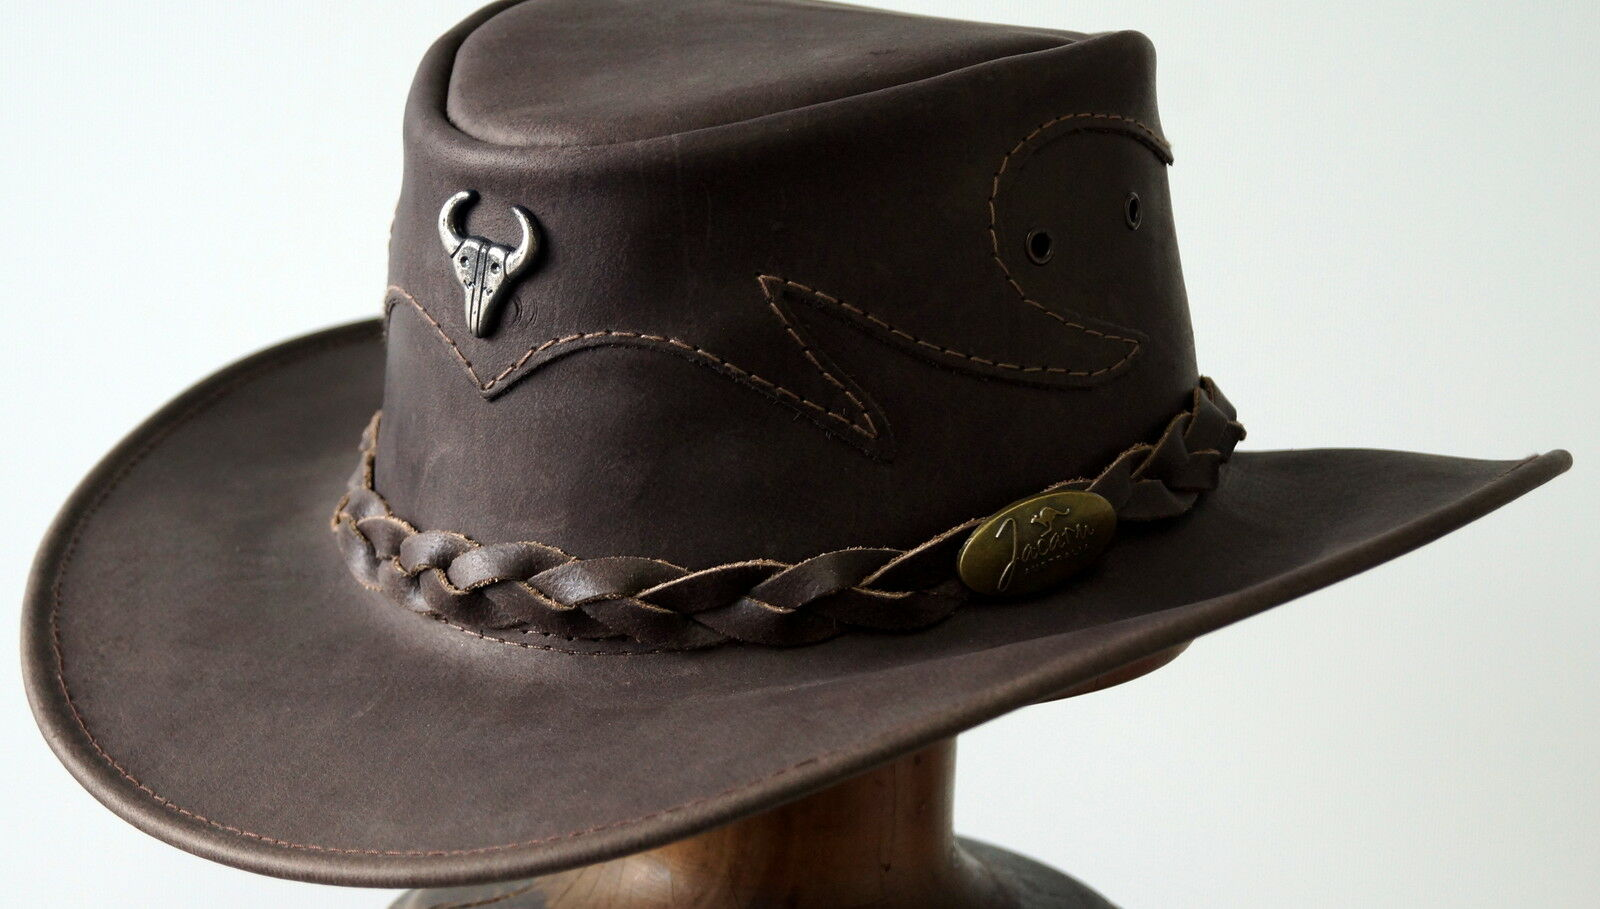 Jacaru Buffalo Brown Medium Large  hat  Rodeo Texas Cowboy Western SPECIAL hats